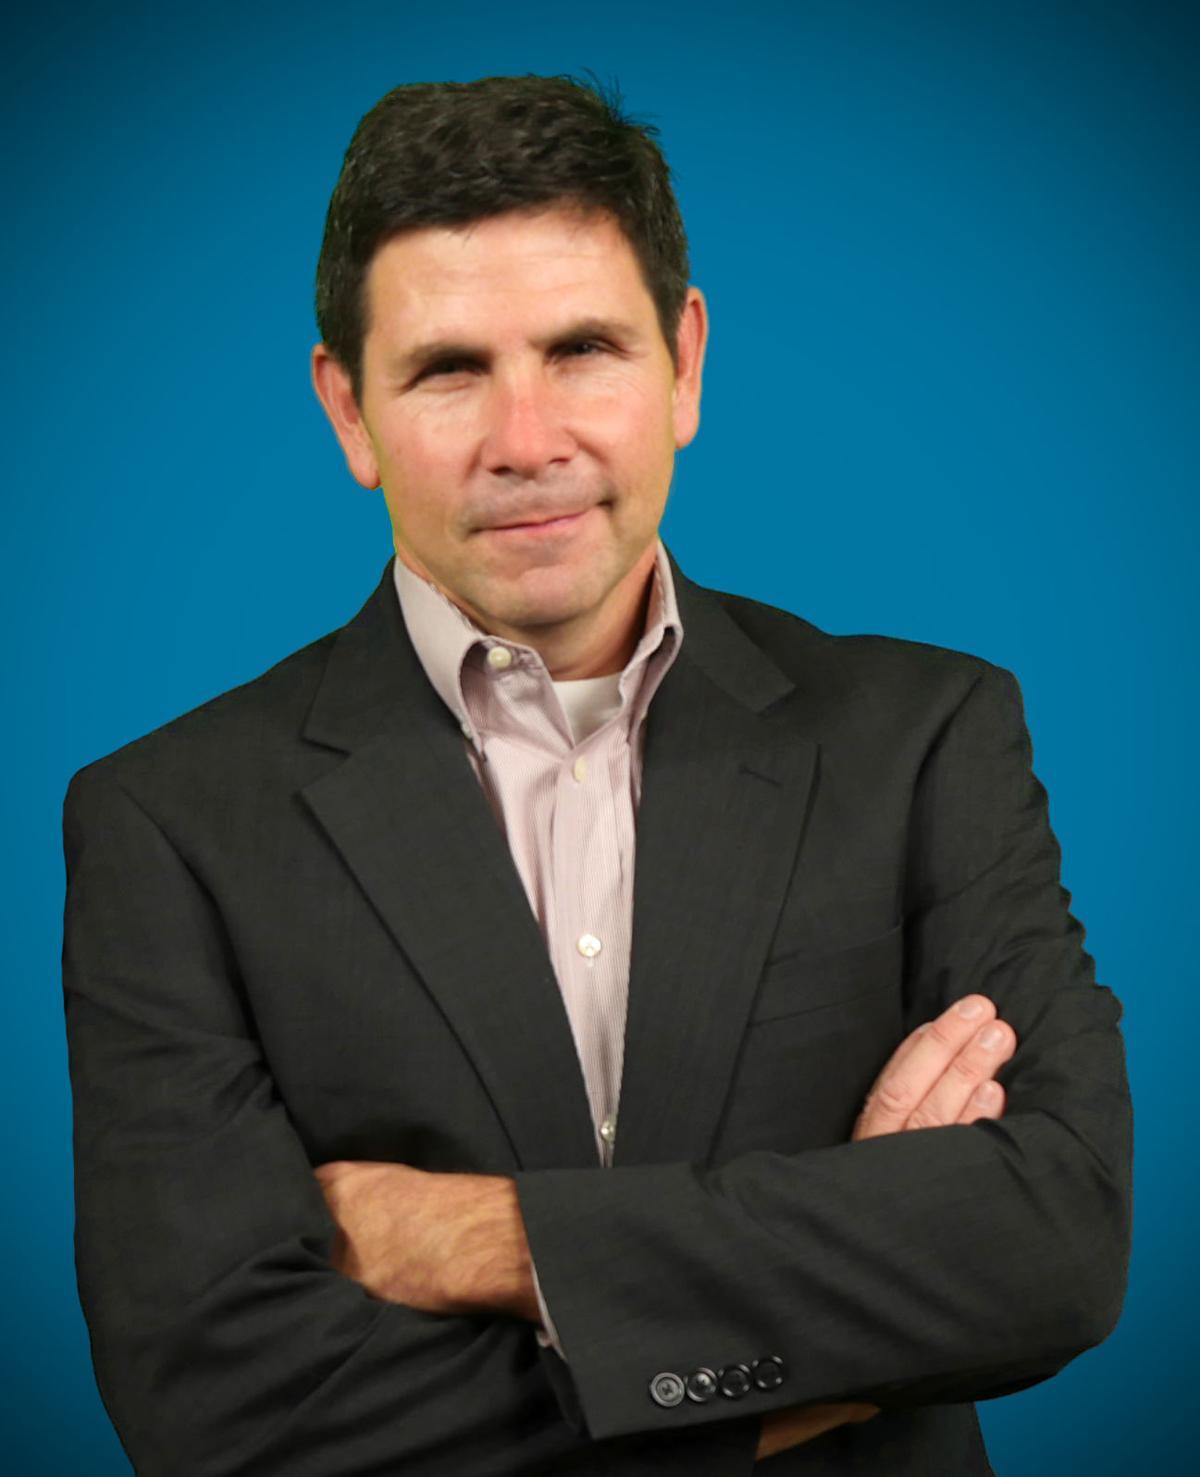 Dr. Alex McFarland